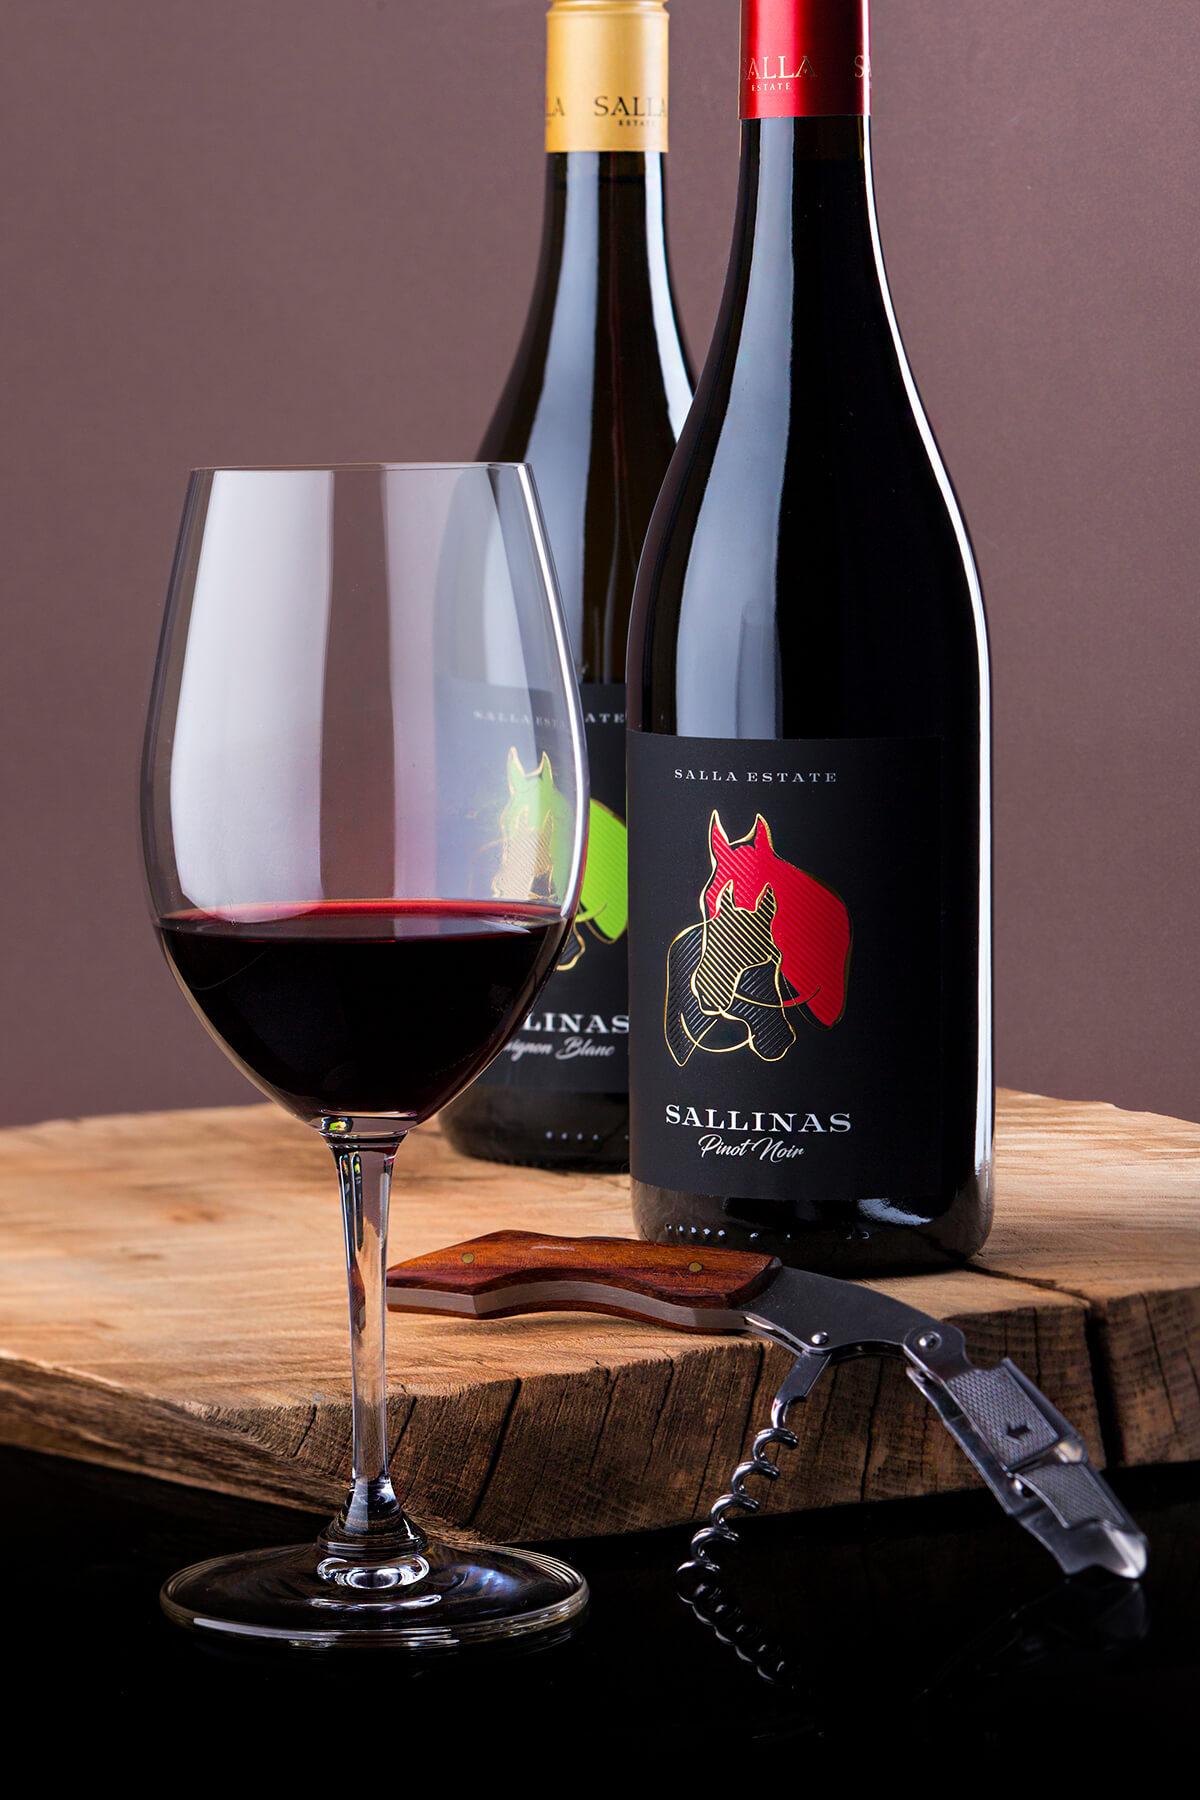 sallinas wines